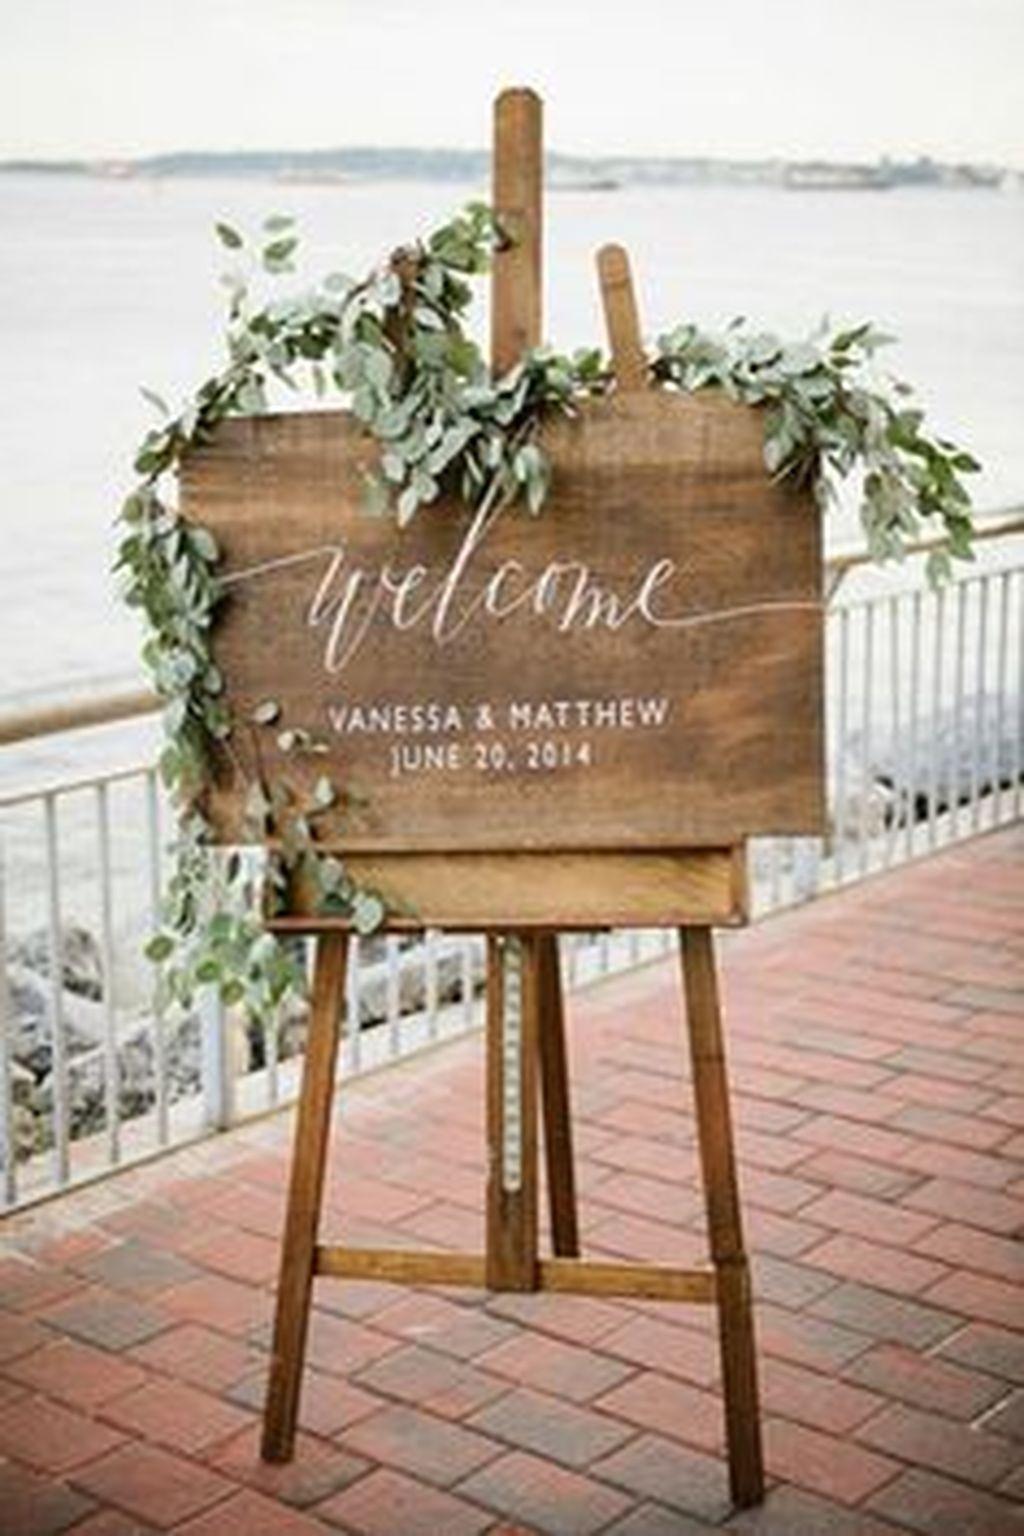 86 elegant rustic wedding decoration ideas 2017 elegant nice 86 elegant rustic wedding decoration ideas 2017 httplovellywedding2017100386 elegant rustic wedding decoration ideas 2017 junglespirit Gallery